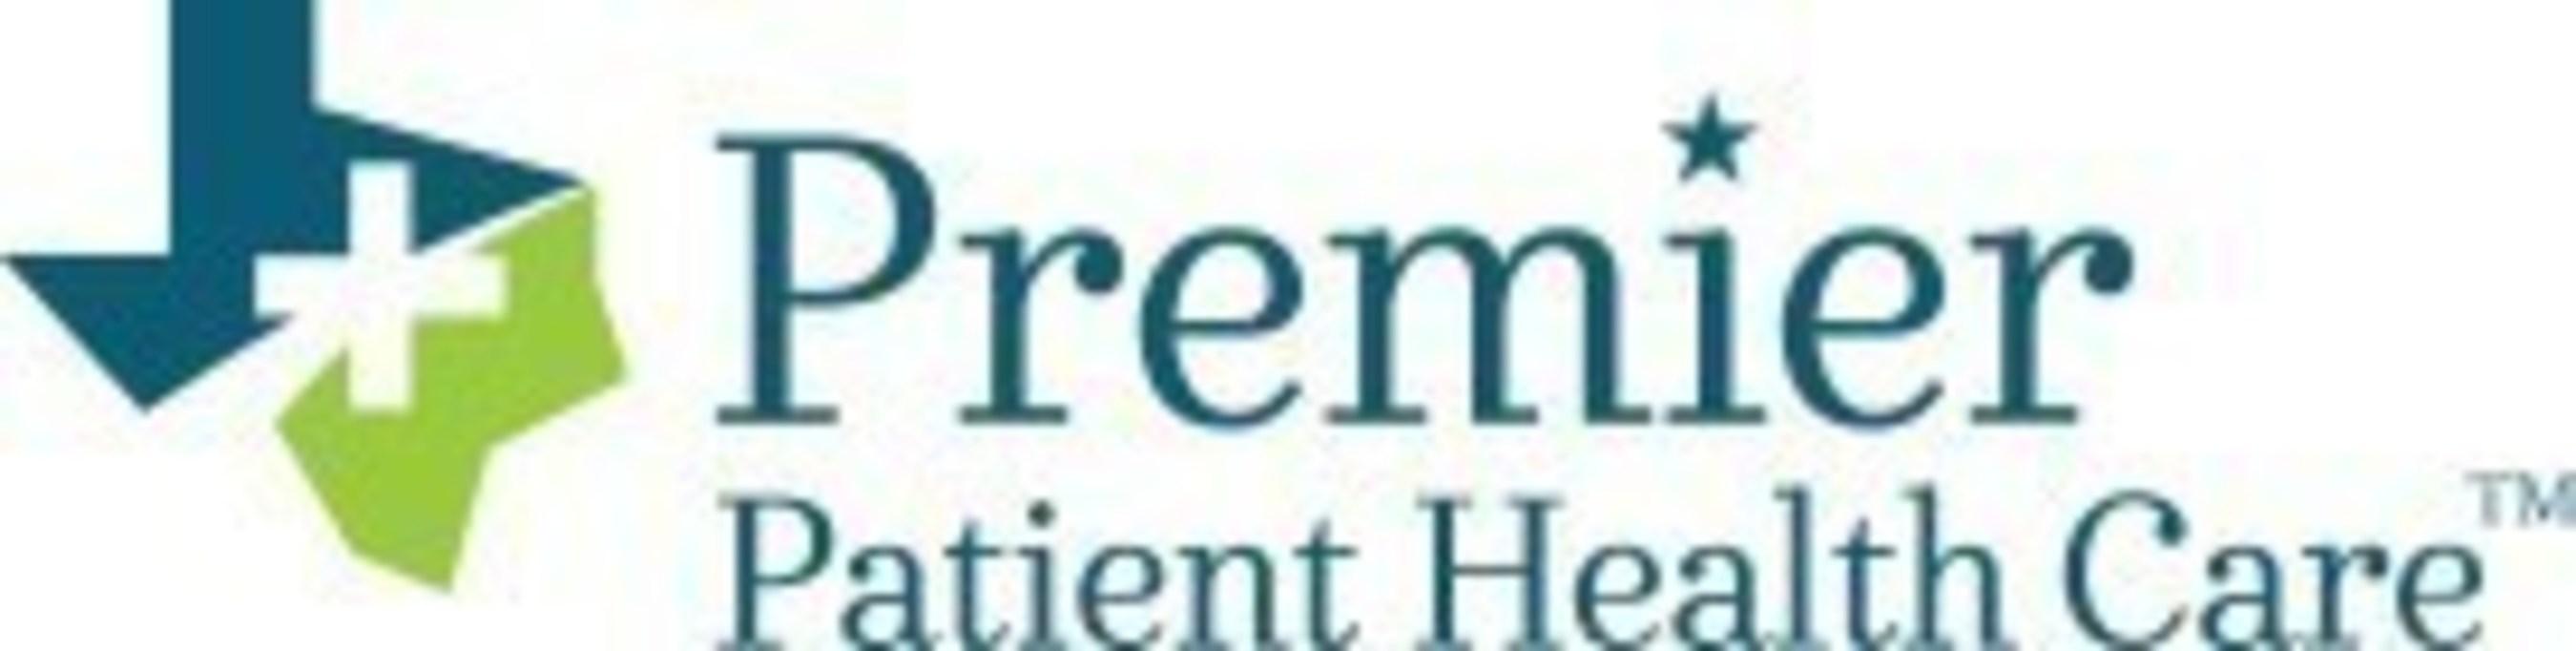 Premier Patient Health Care Aco And Patient Physician Network Ppn Join Forces As Premier Patient Network